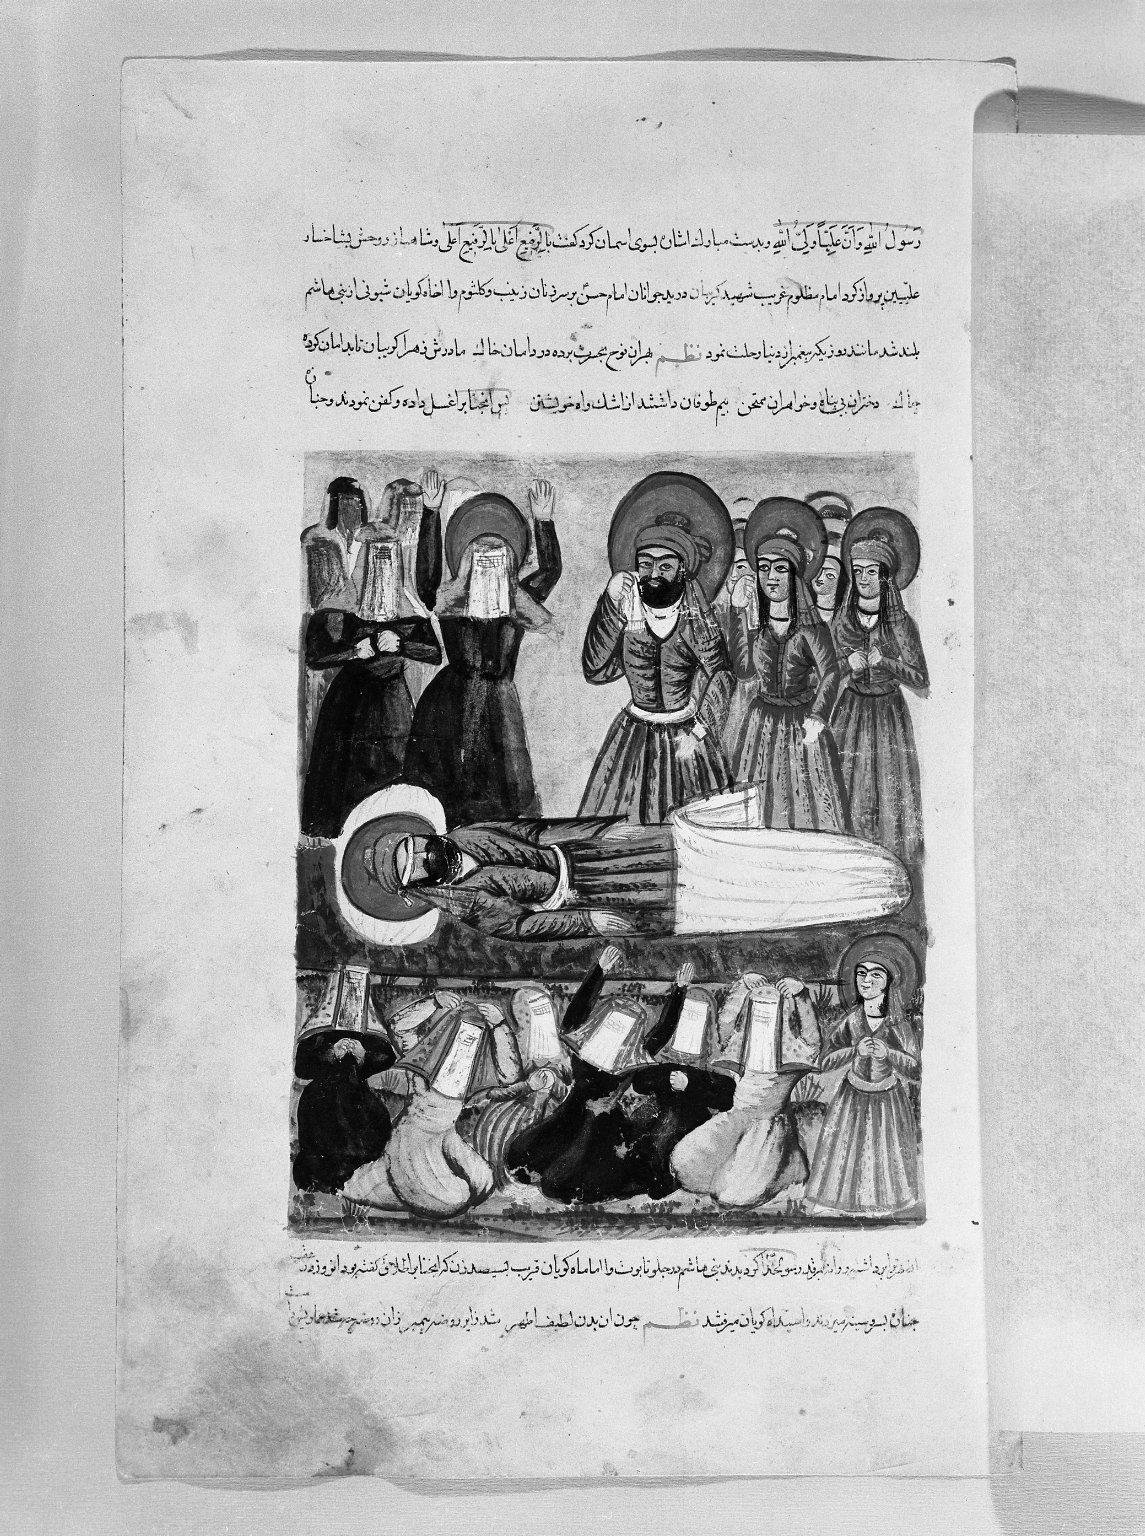 File:Funeral of Imam Husayn.jpg